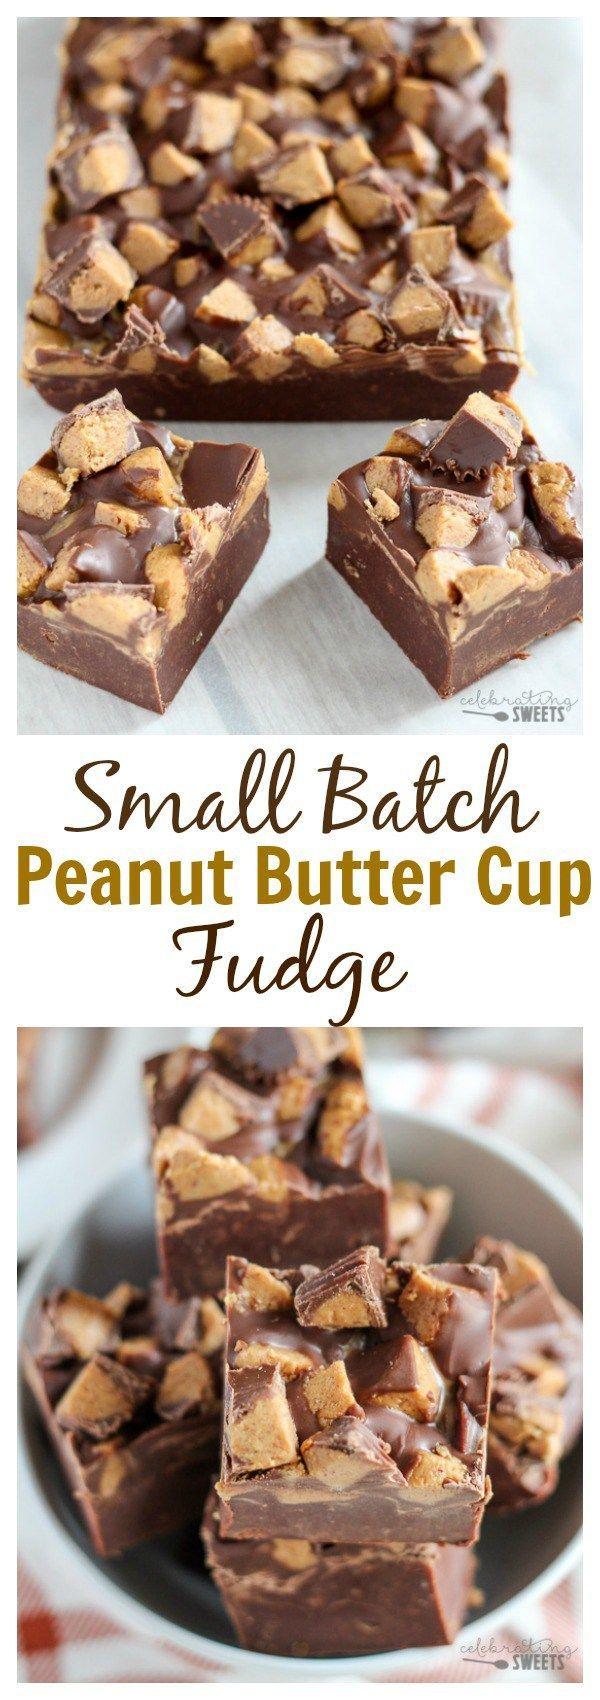 Small Batch Peanut Butter Cup Fudge